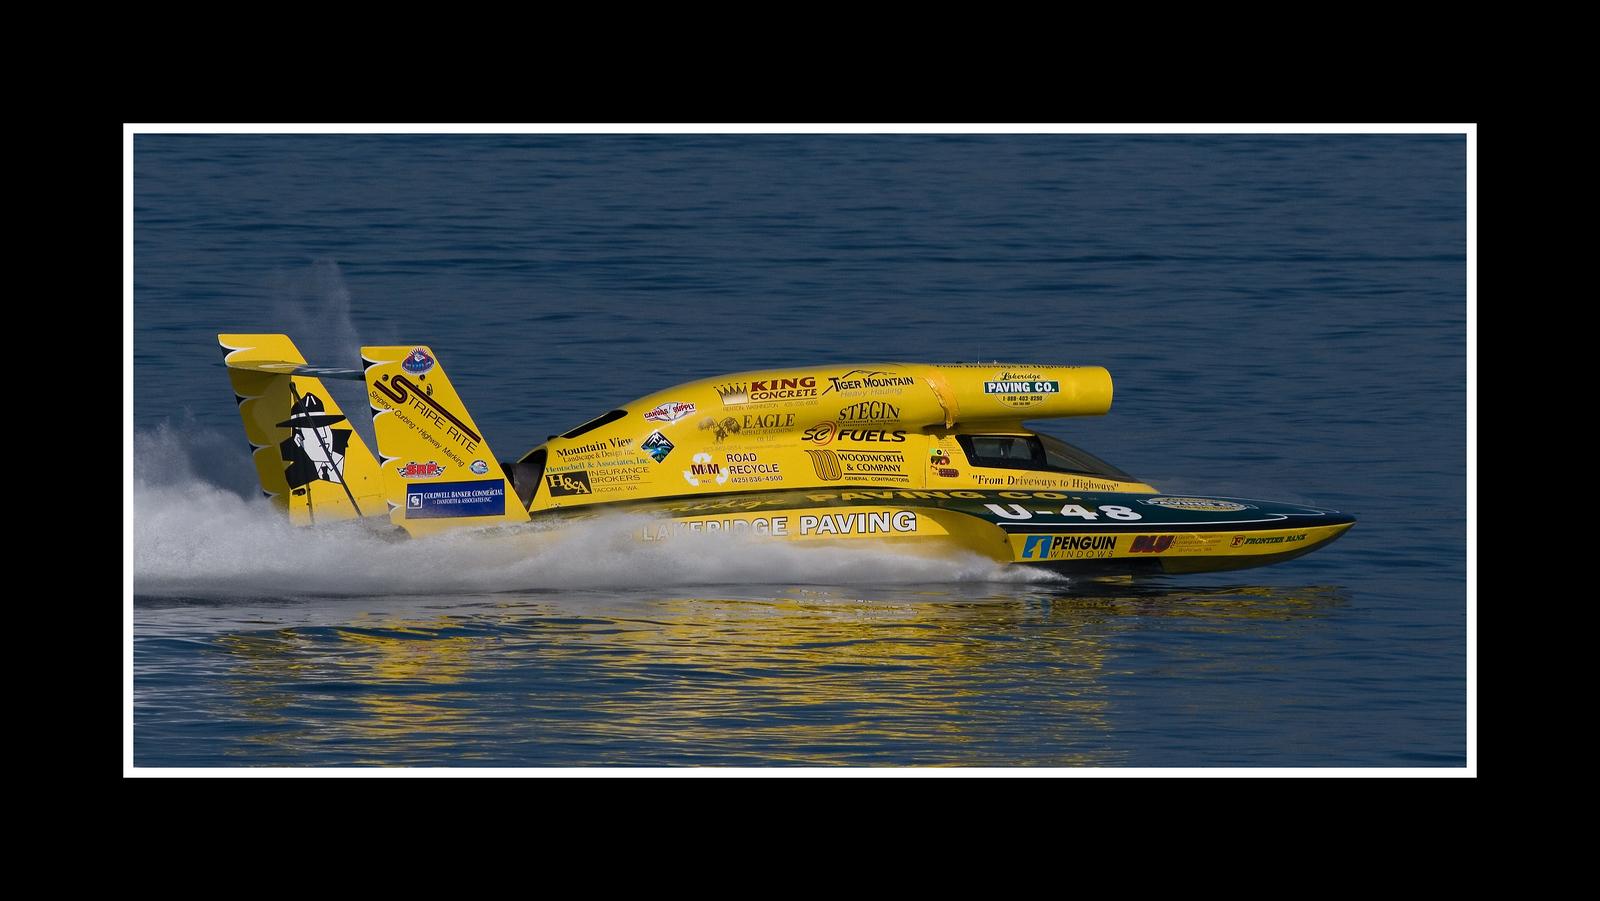 IMAGE: https://photos.smugmug.com/Sports/THUNDERBOAT-REGATTA-2007/i-WnBdrcR/0/713274a6/X3/JPEG%20Thunderboat%200366-X3.jpg